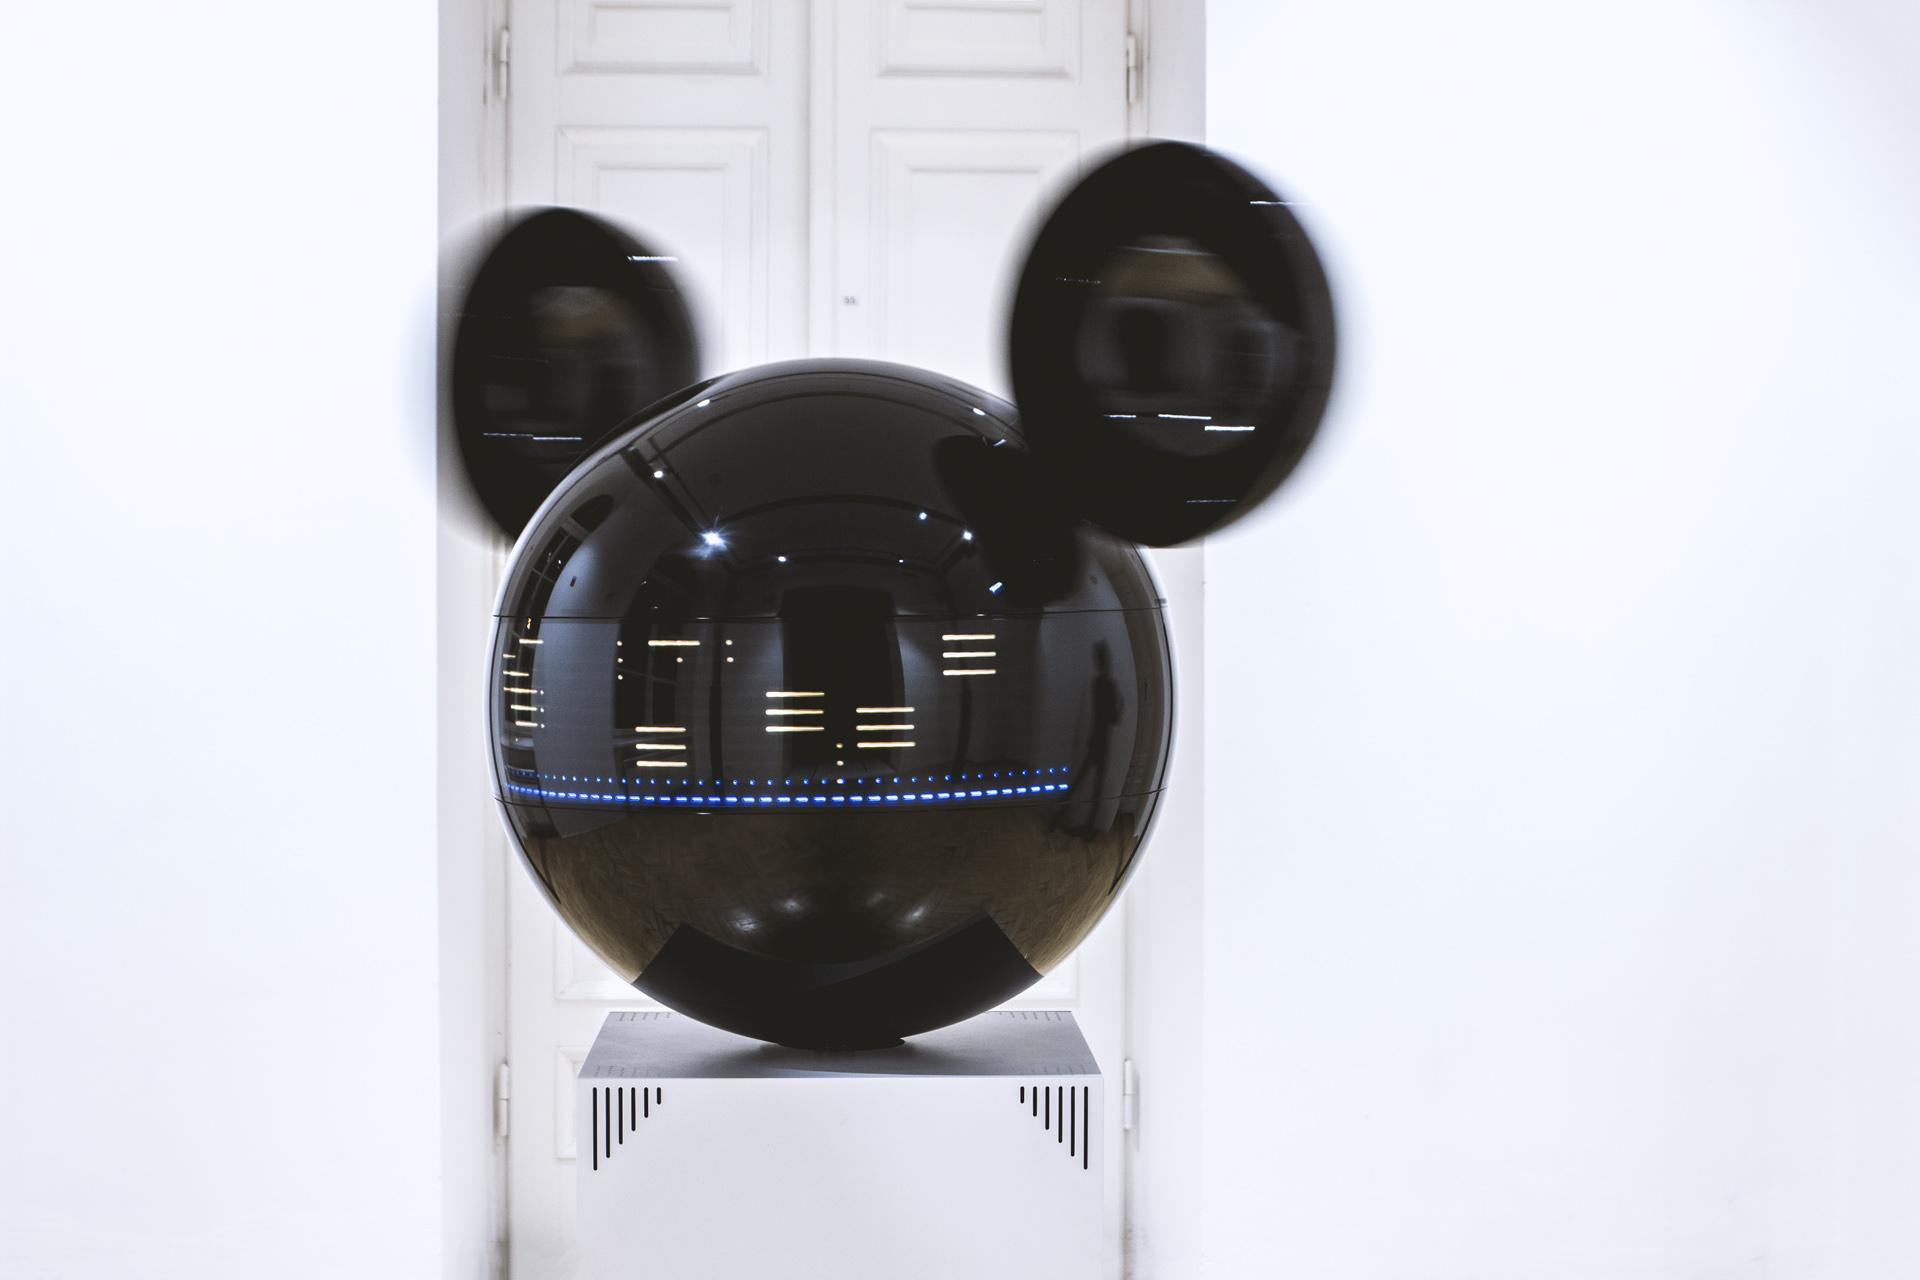 Mickeyphon_panGenerator (3)